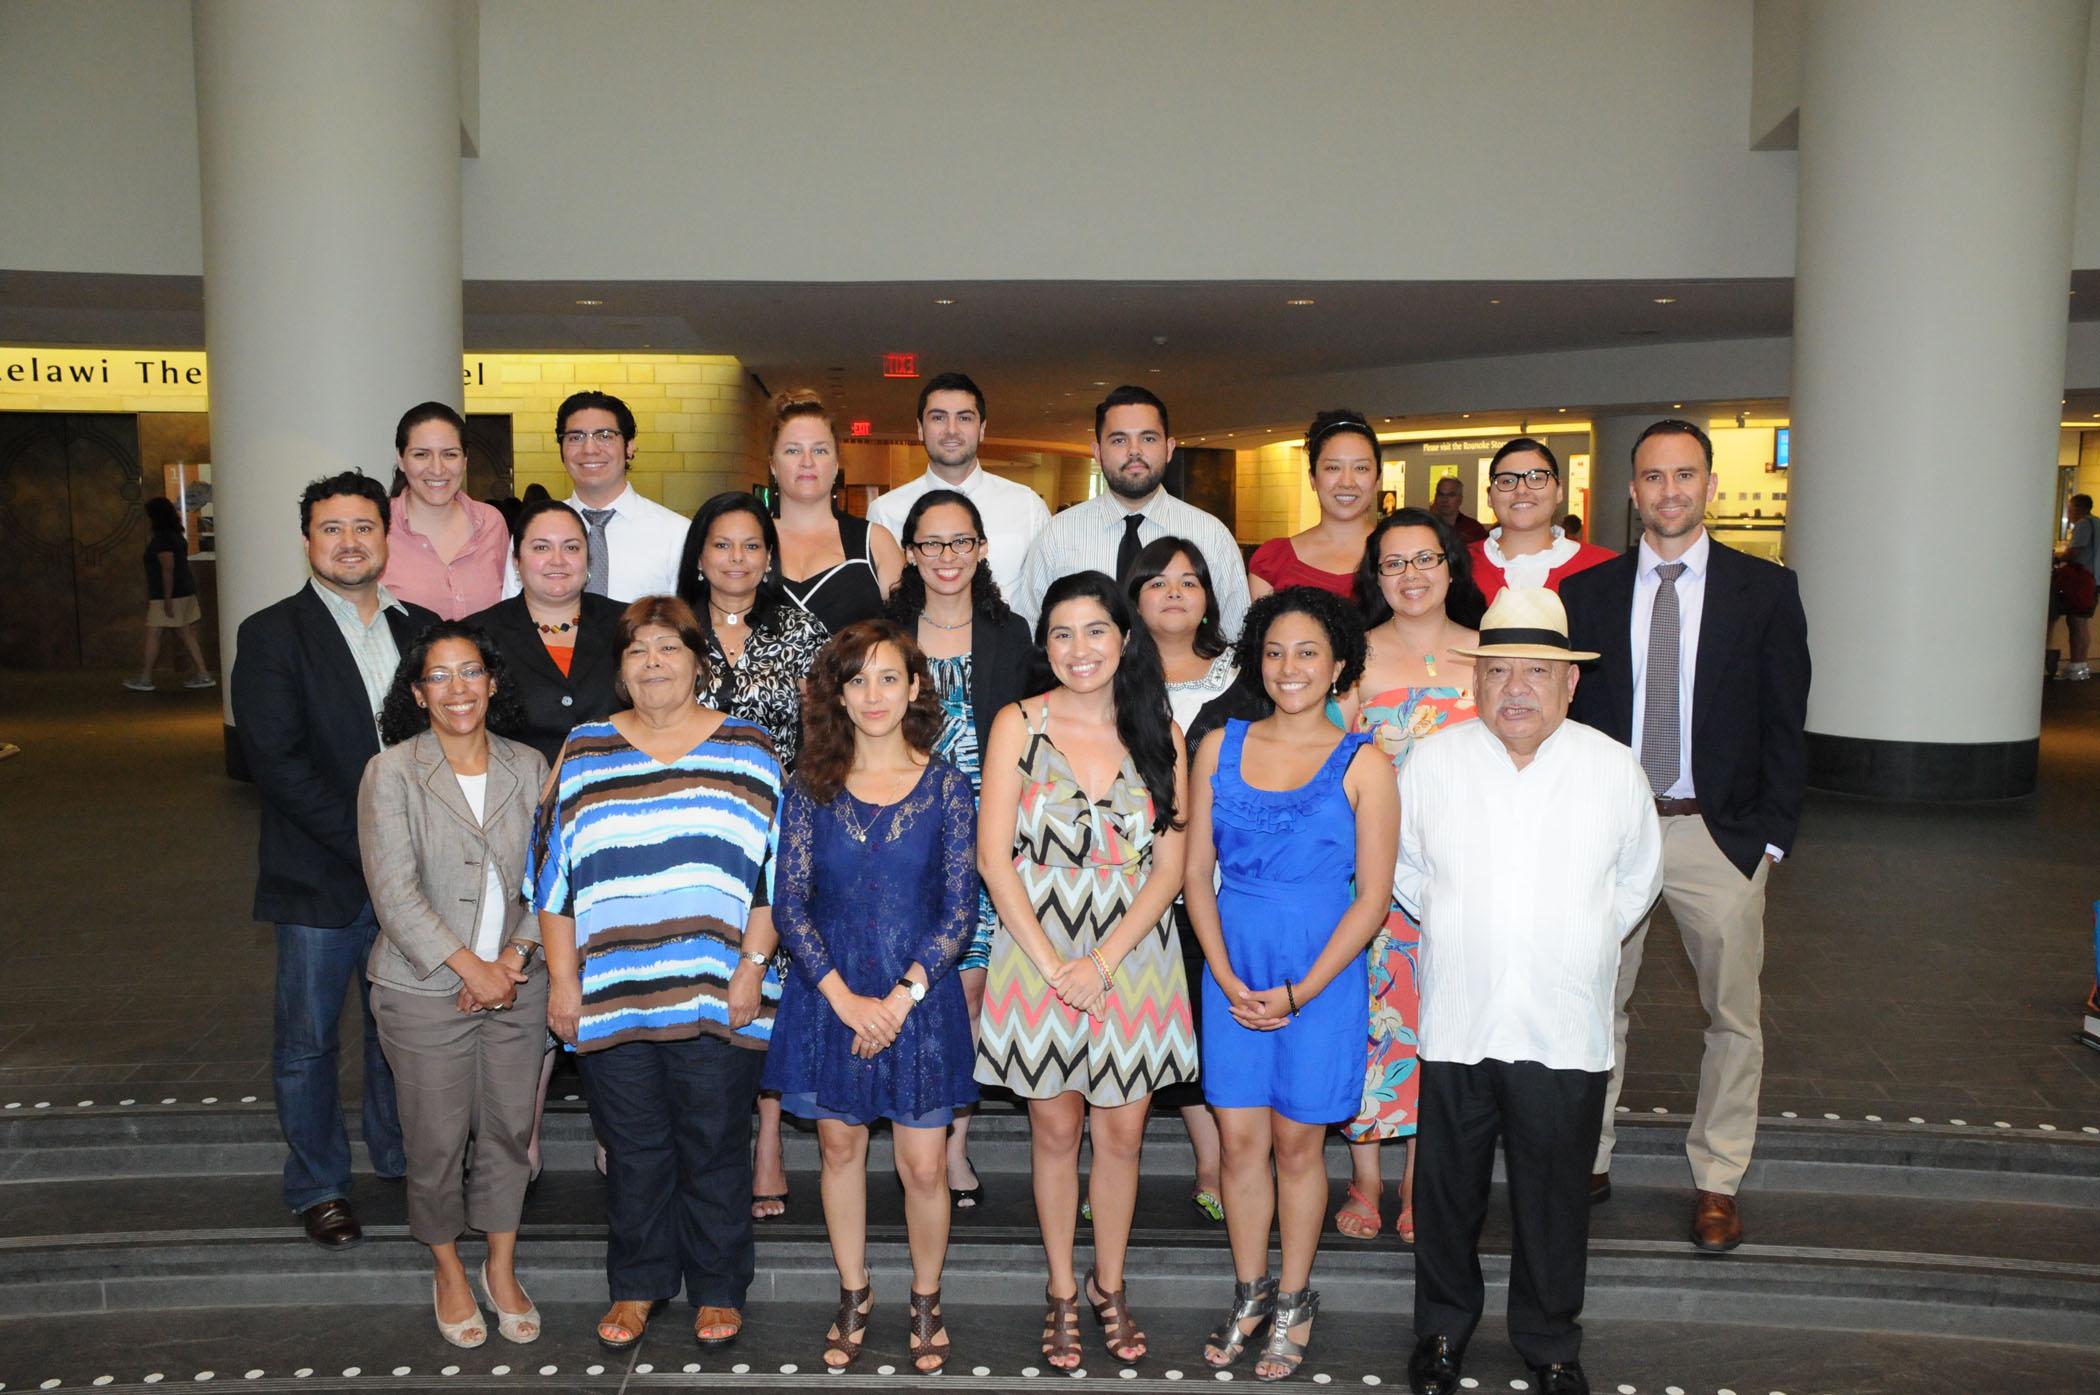 Latino Museum Studies Program, 2012. Images courtesy of Smithsonian Latino Cente